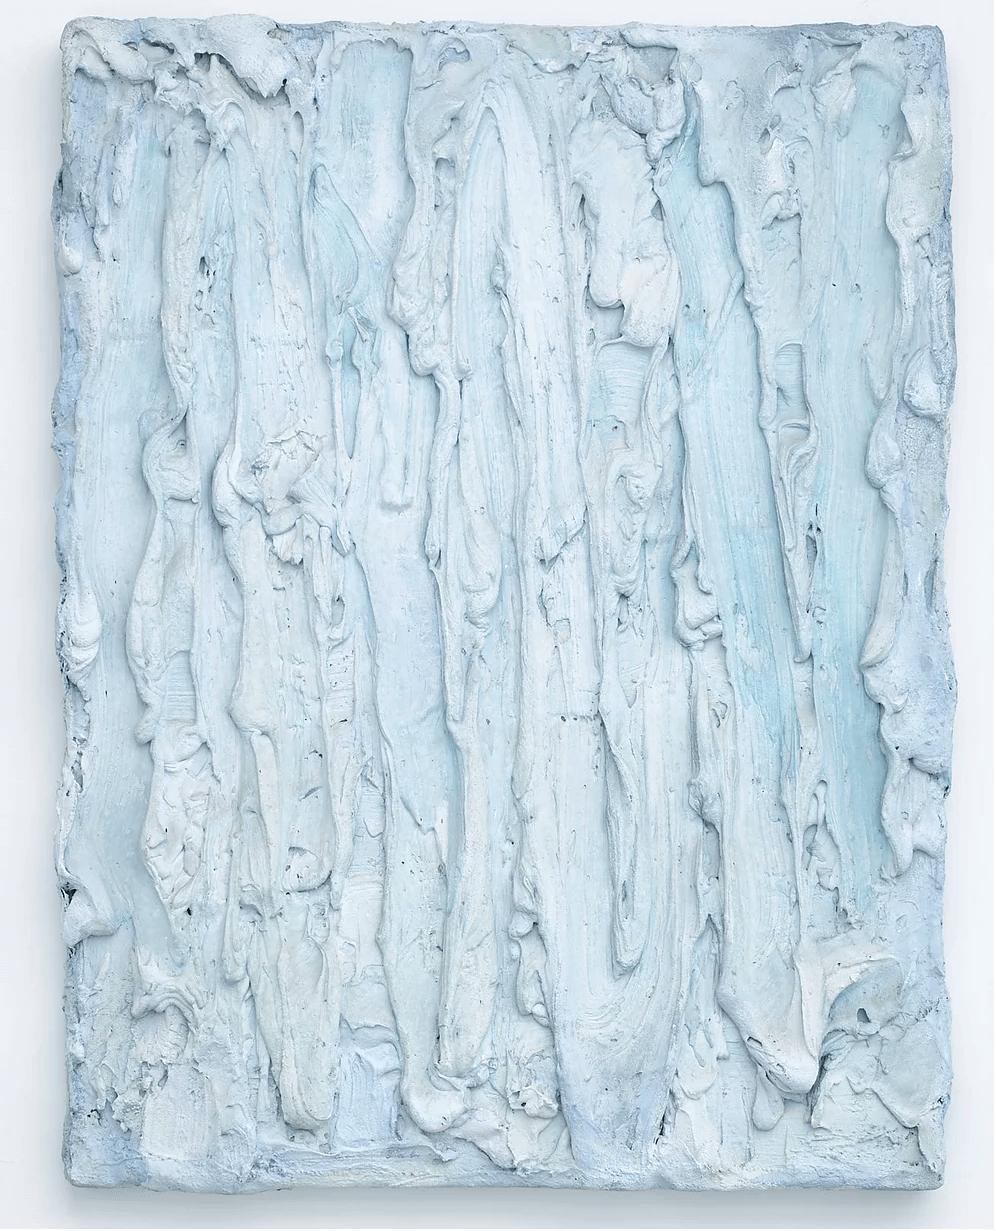 Bram Bogart, Variété, 1961, mixed media, 132 × 110 cm (courtesy of Saatchi Gallery and Vigo Gallery)